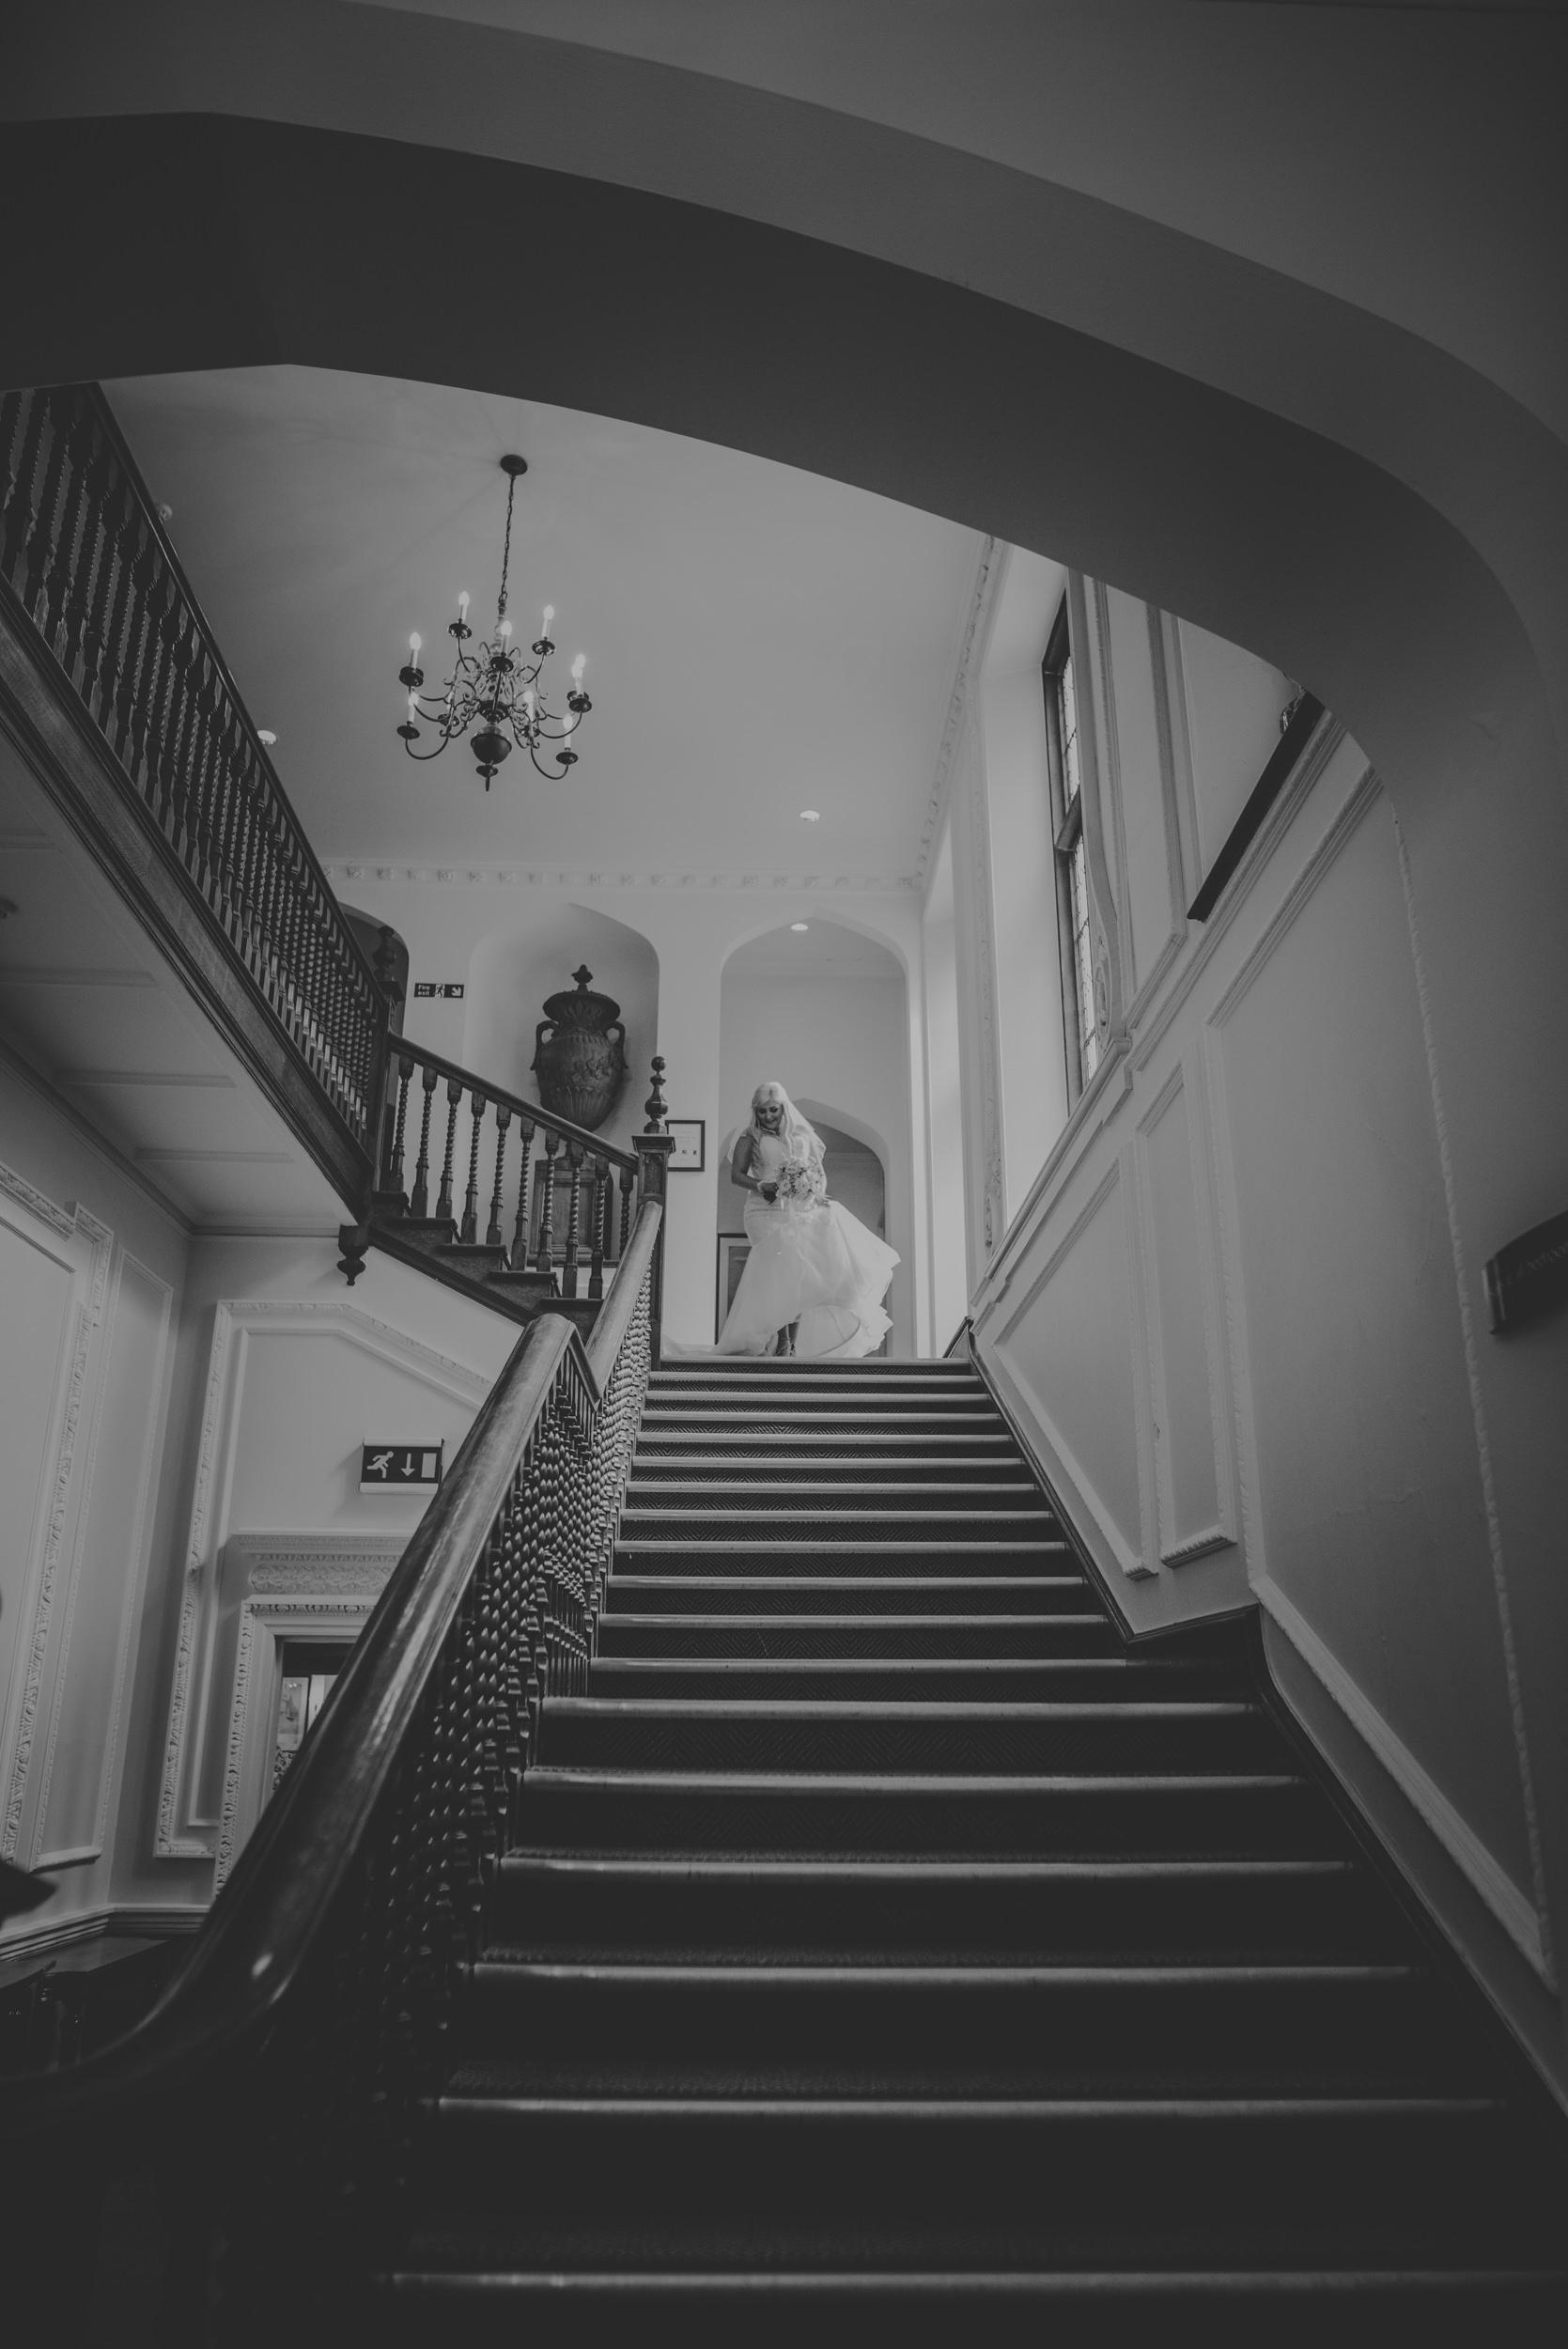 Rachel-and-James-Wedding-Horsley-Towers-State-Manu-Mendoza-Wedding-Photography-193.jpg